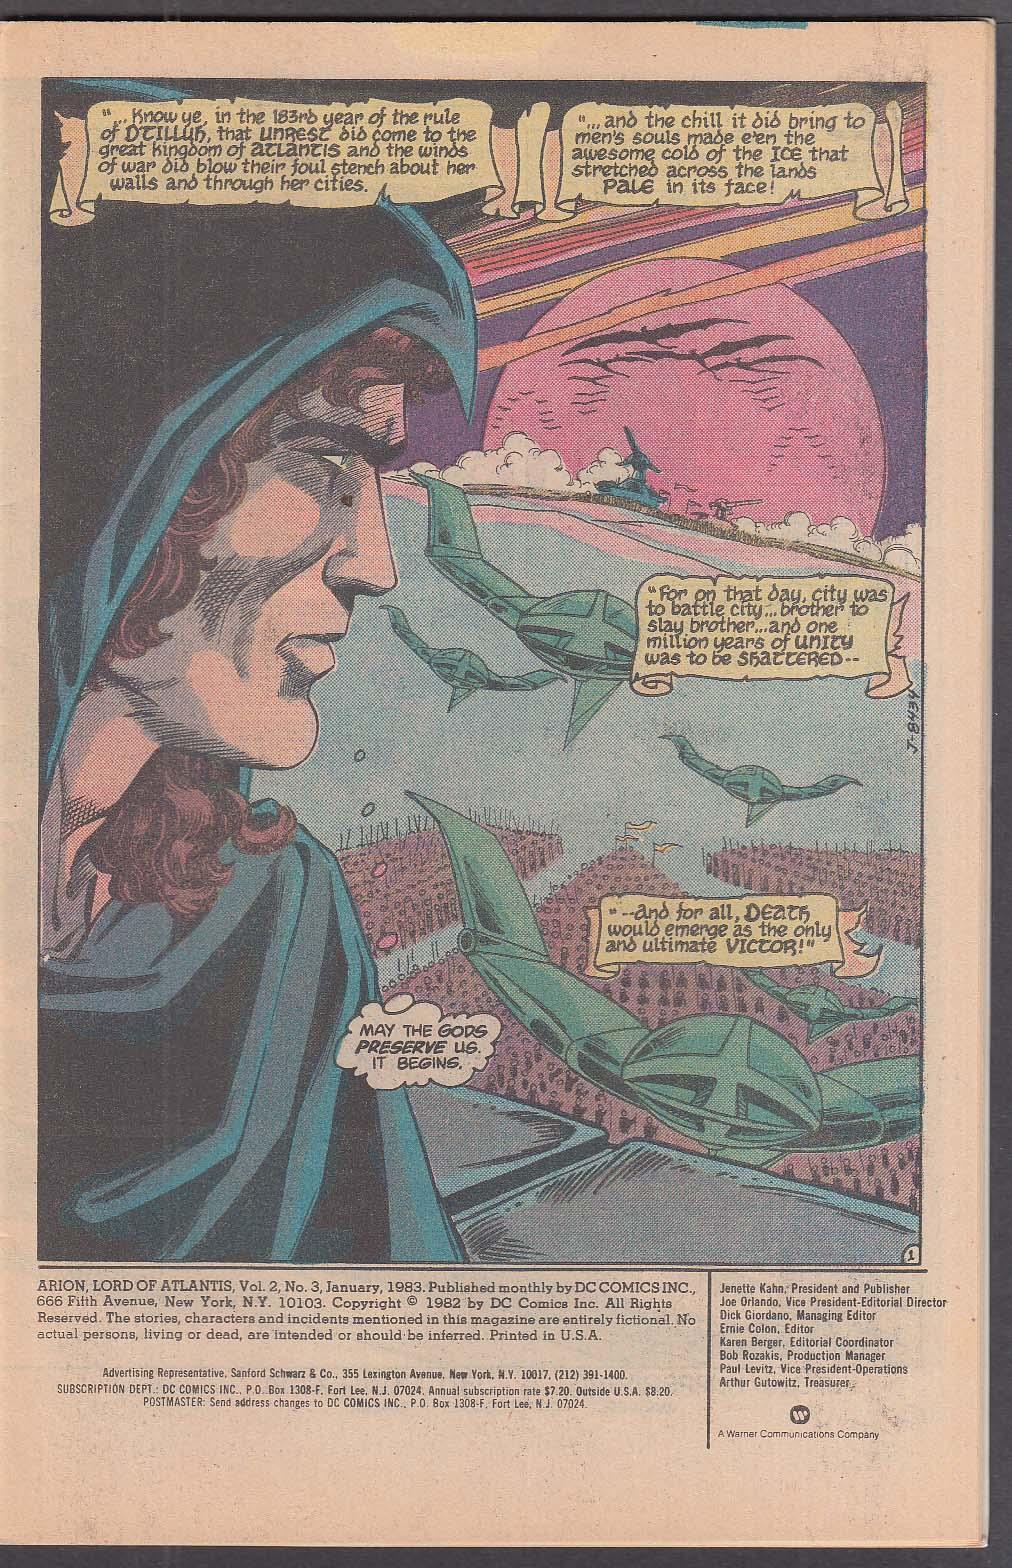 ARION Lord of Atlantis #3 DC comic book 1 1983